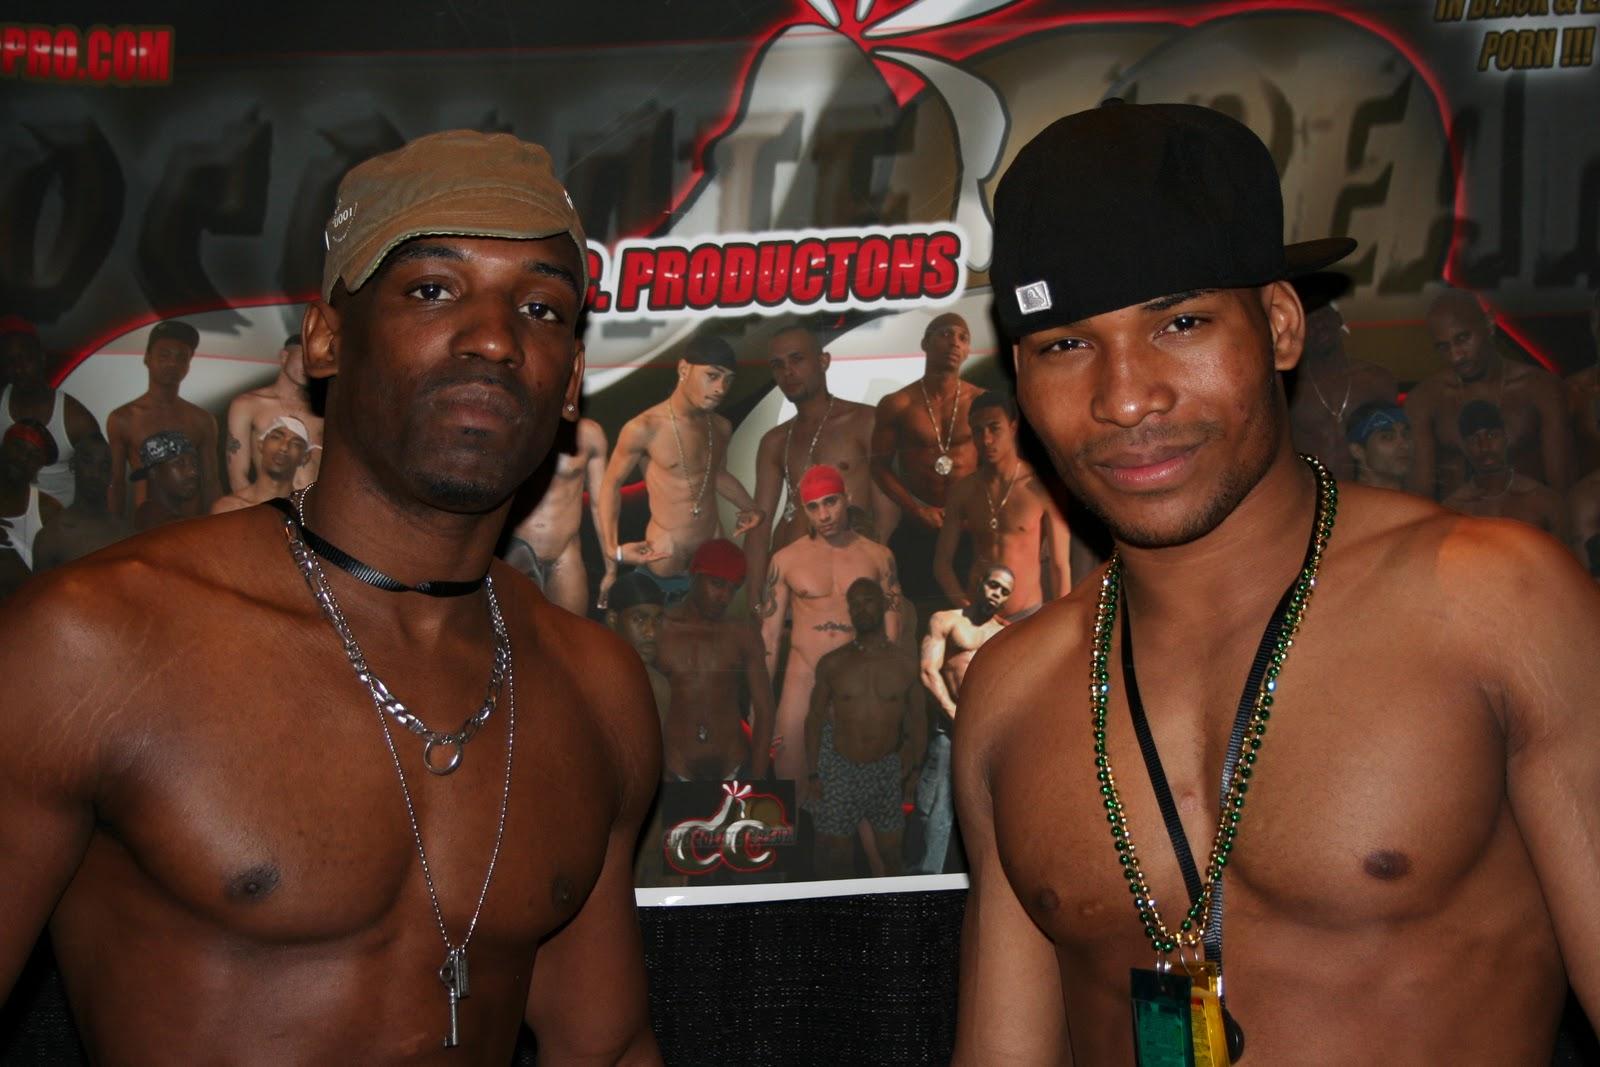 nyc Gay erotic expo